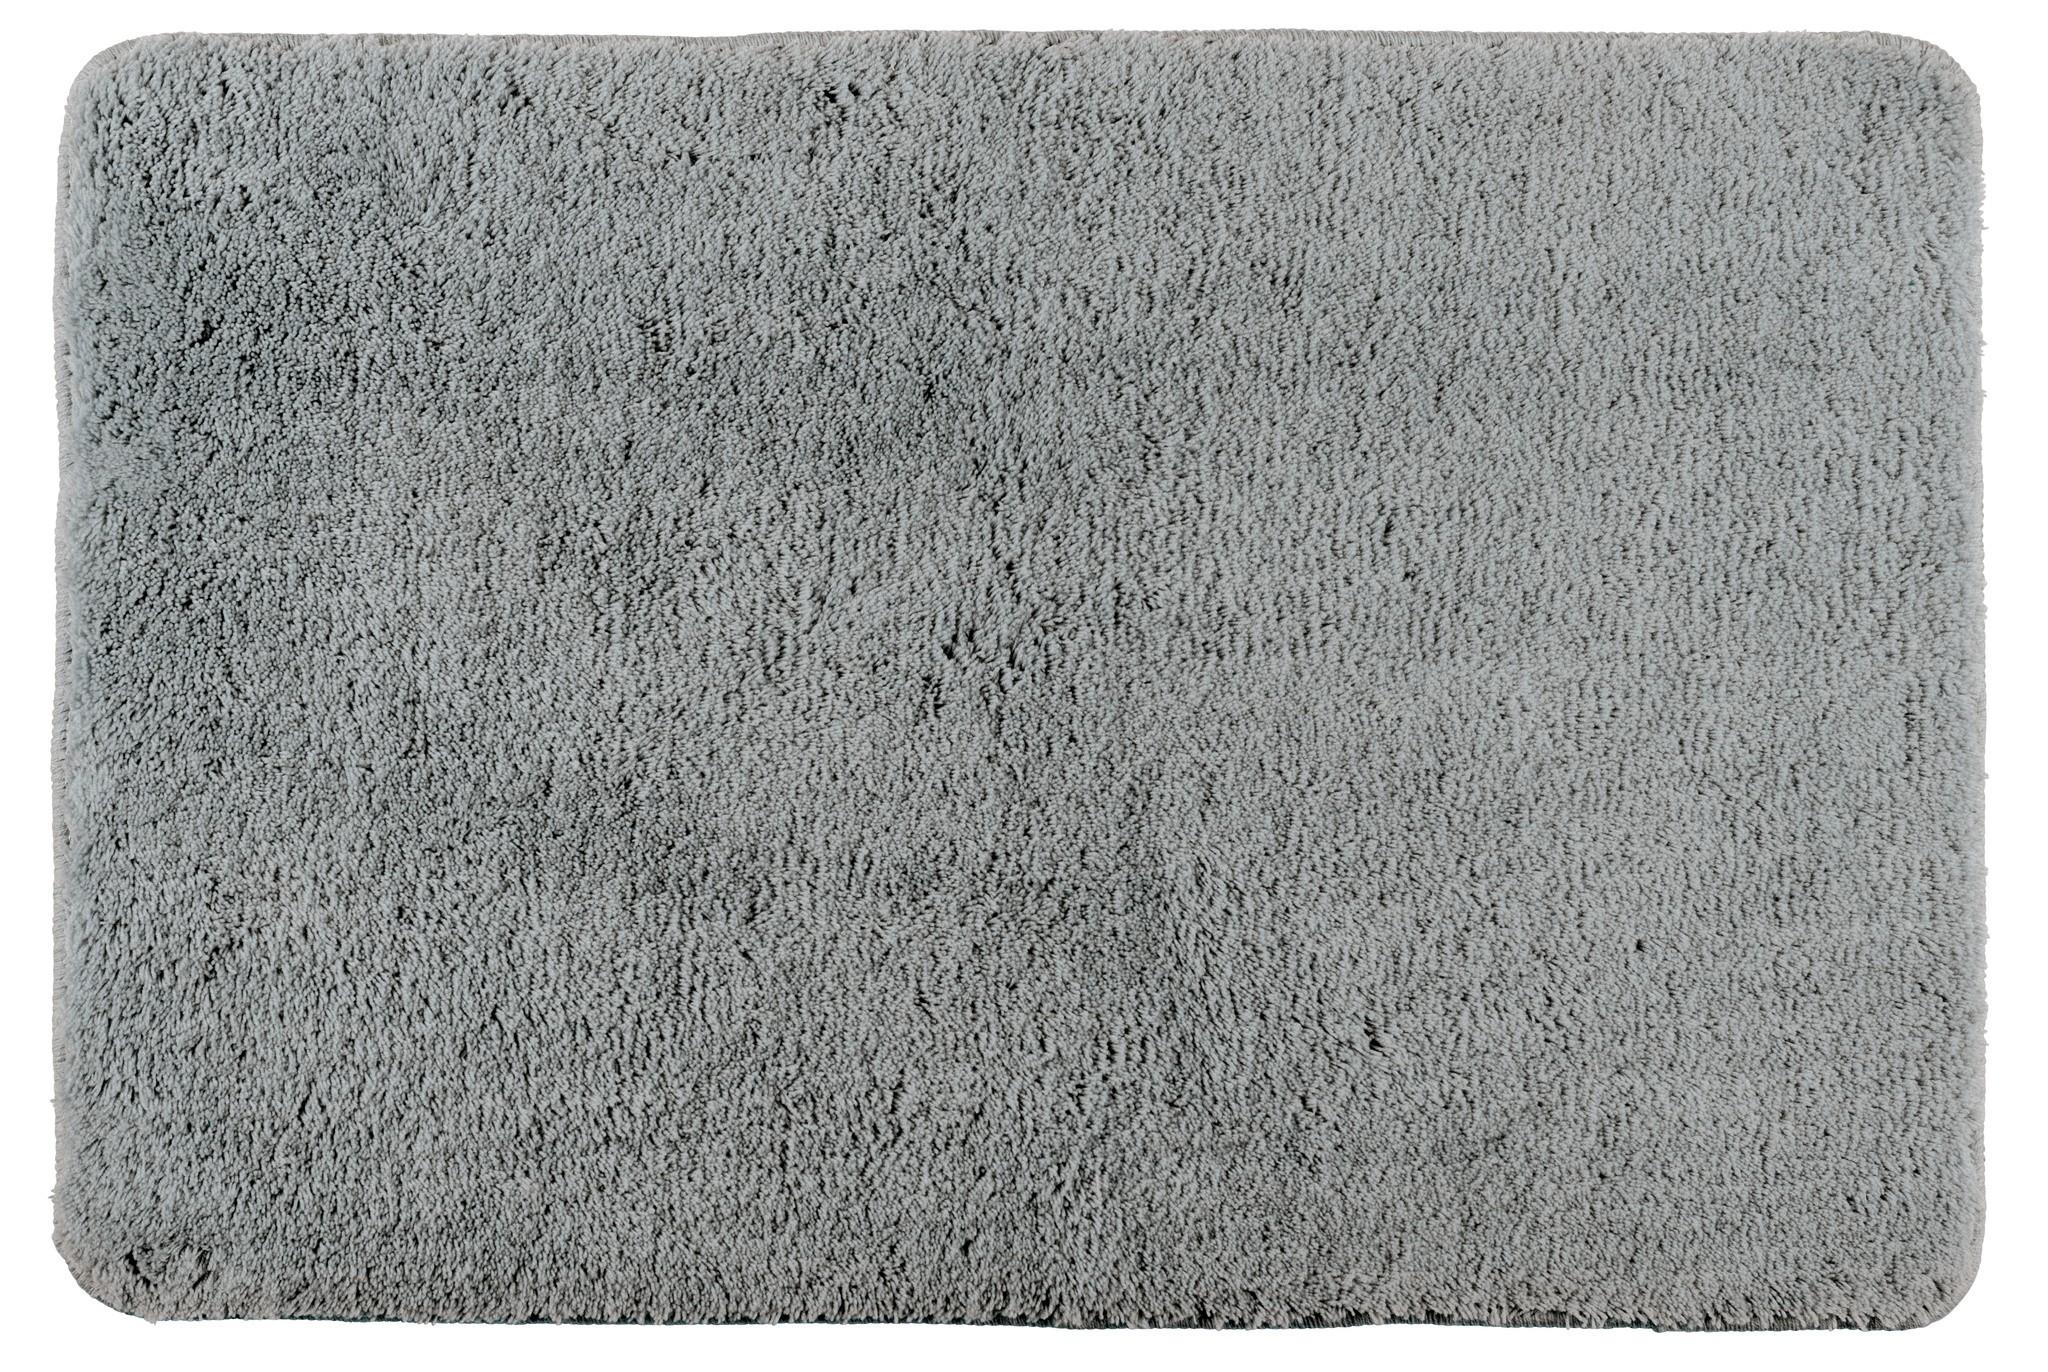 Badteppich Poly Grey, 60 x 90 cm